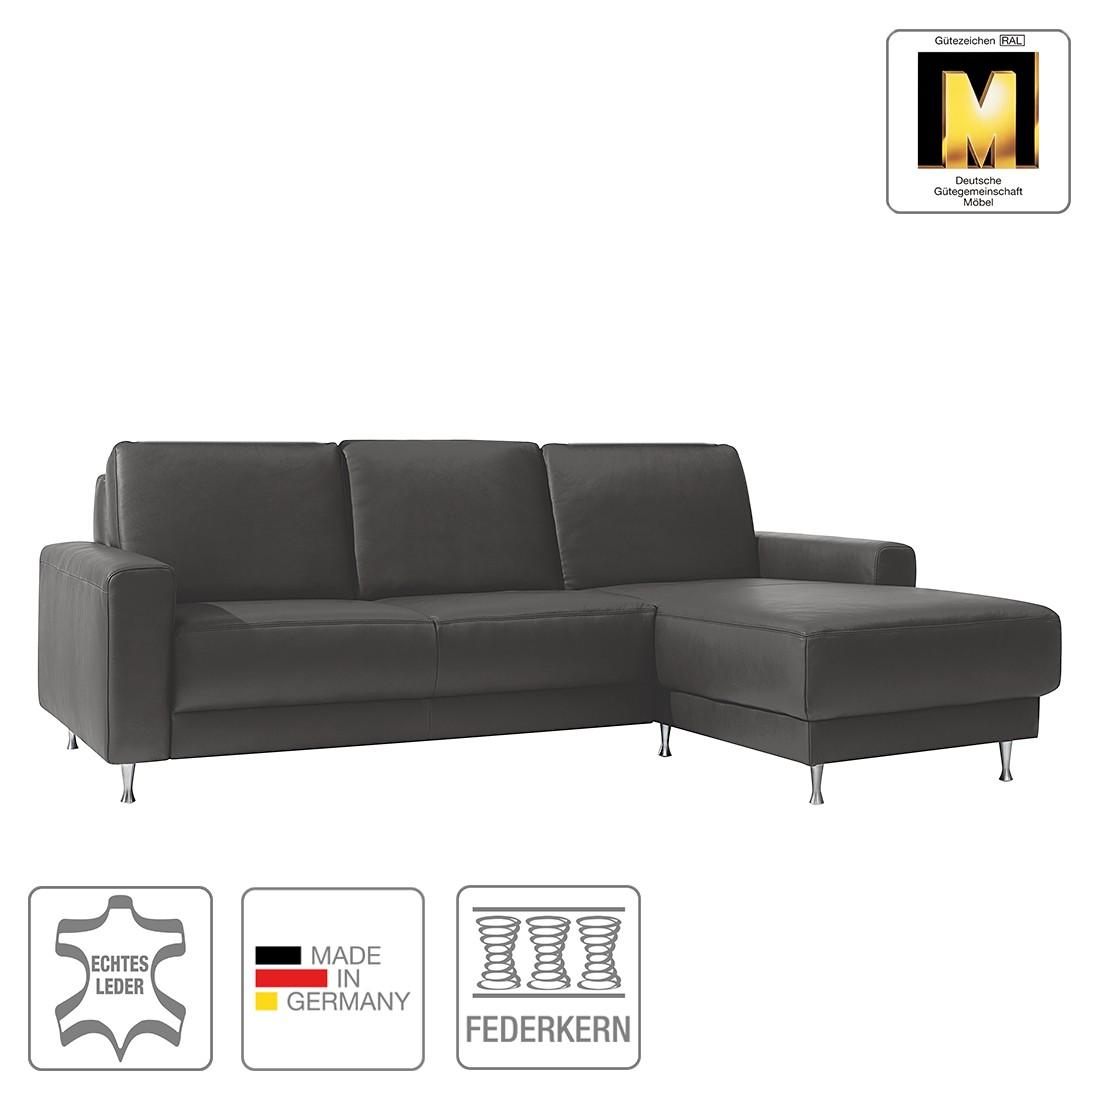 ecksofa jazz i echtleder ohne kopfst tze longchair ottomane davorstehend rechts grau fm. Black Bedroom Furniture Sets. Home Design Ideas